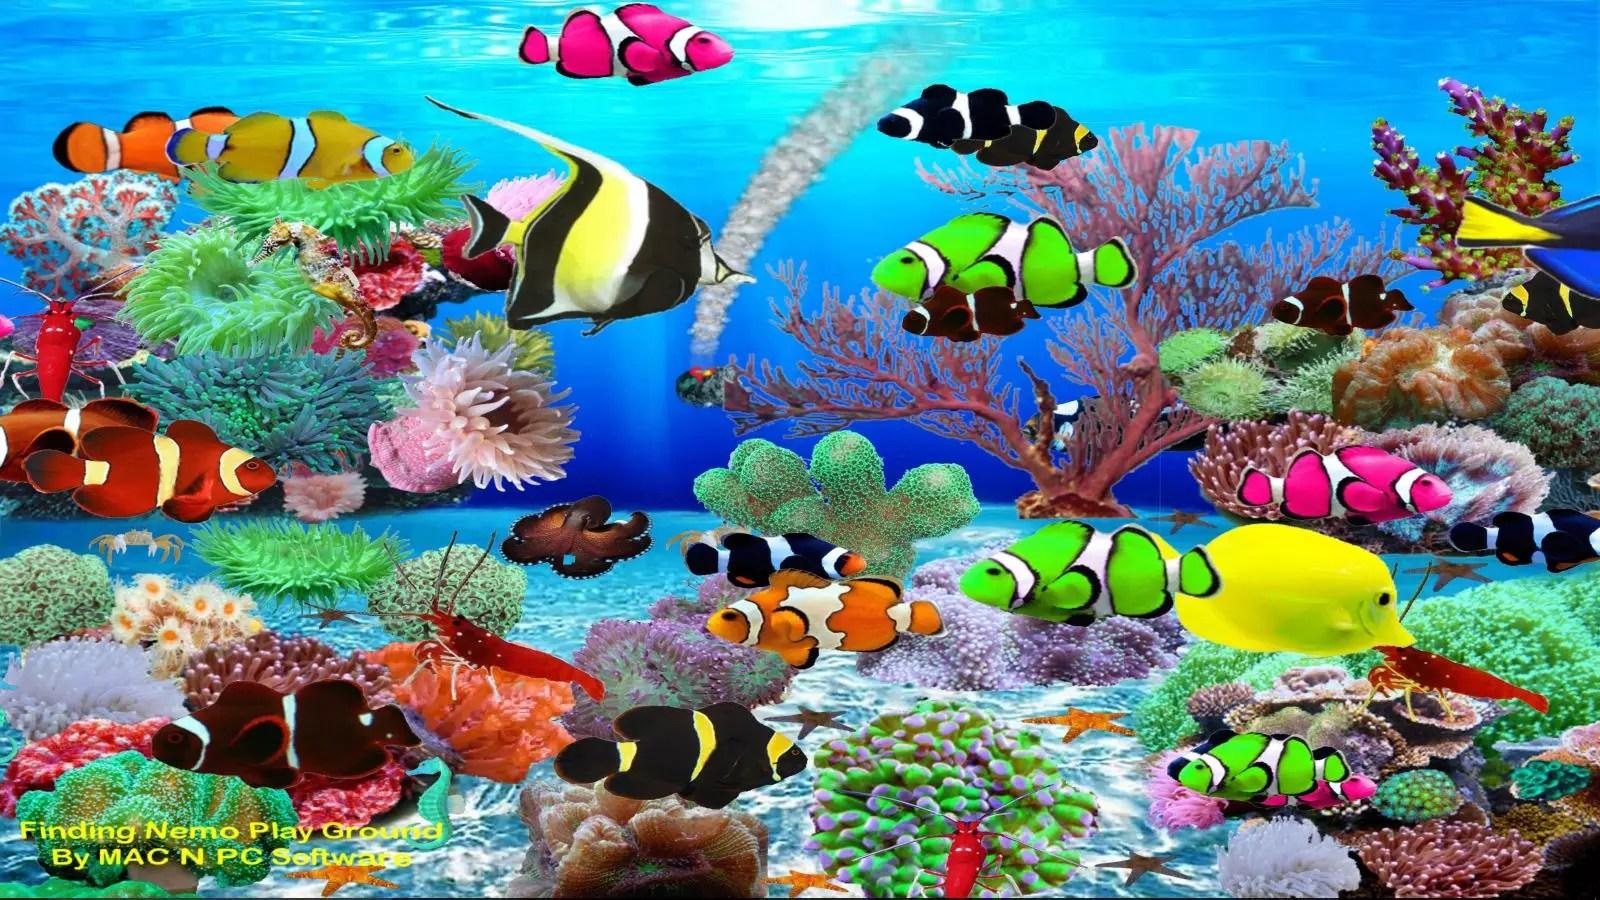 Iphone 5 Clown Fish Wallpaper Finding Nemo Aquarium Download